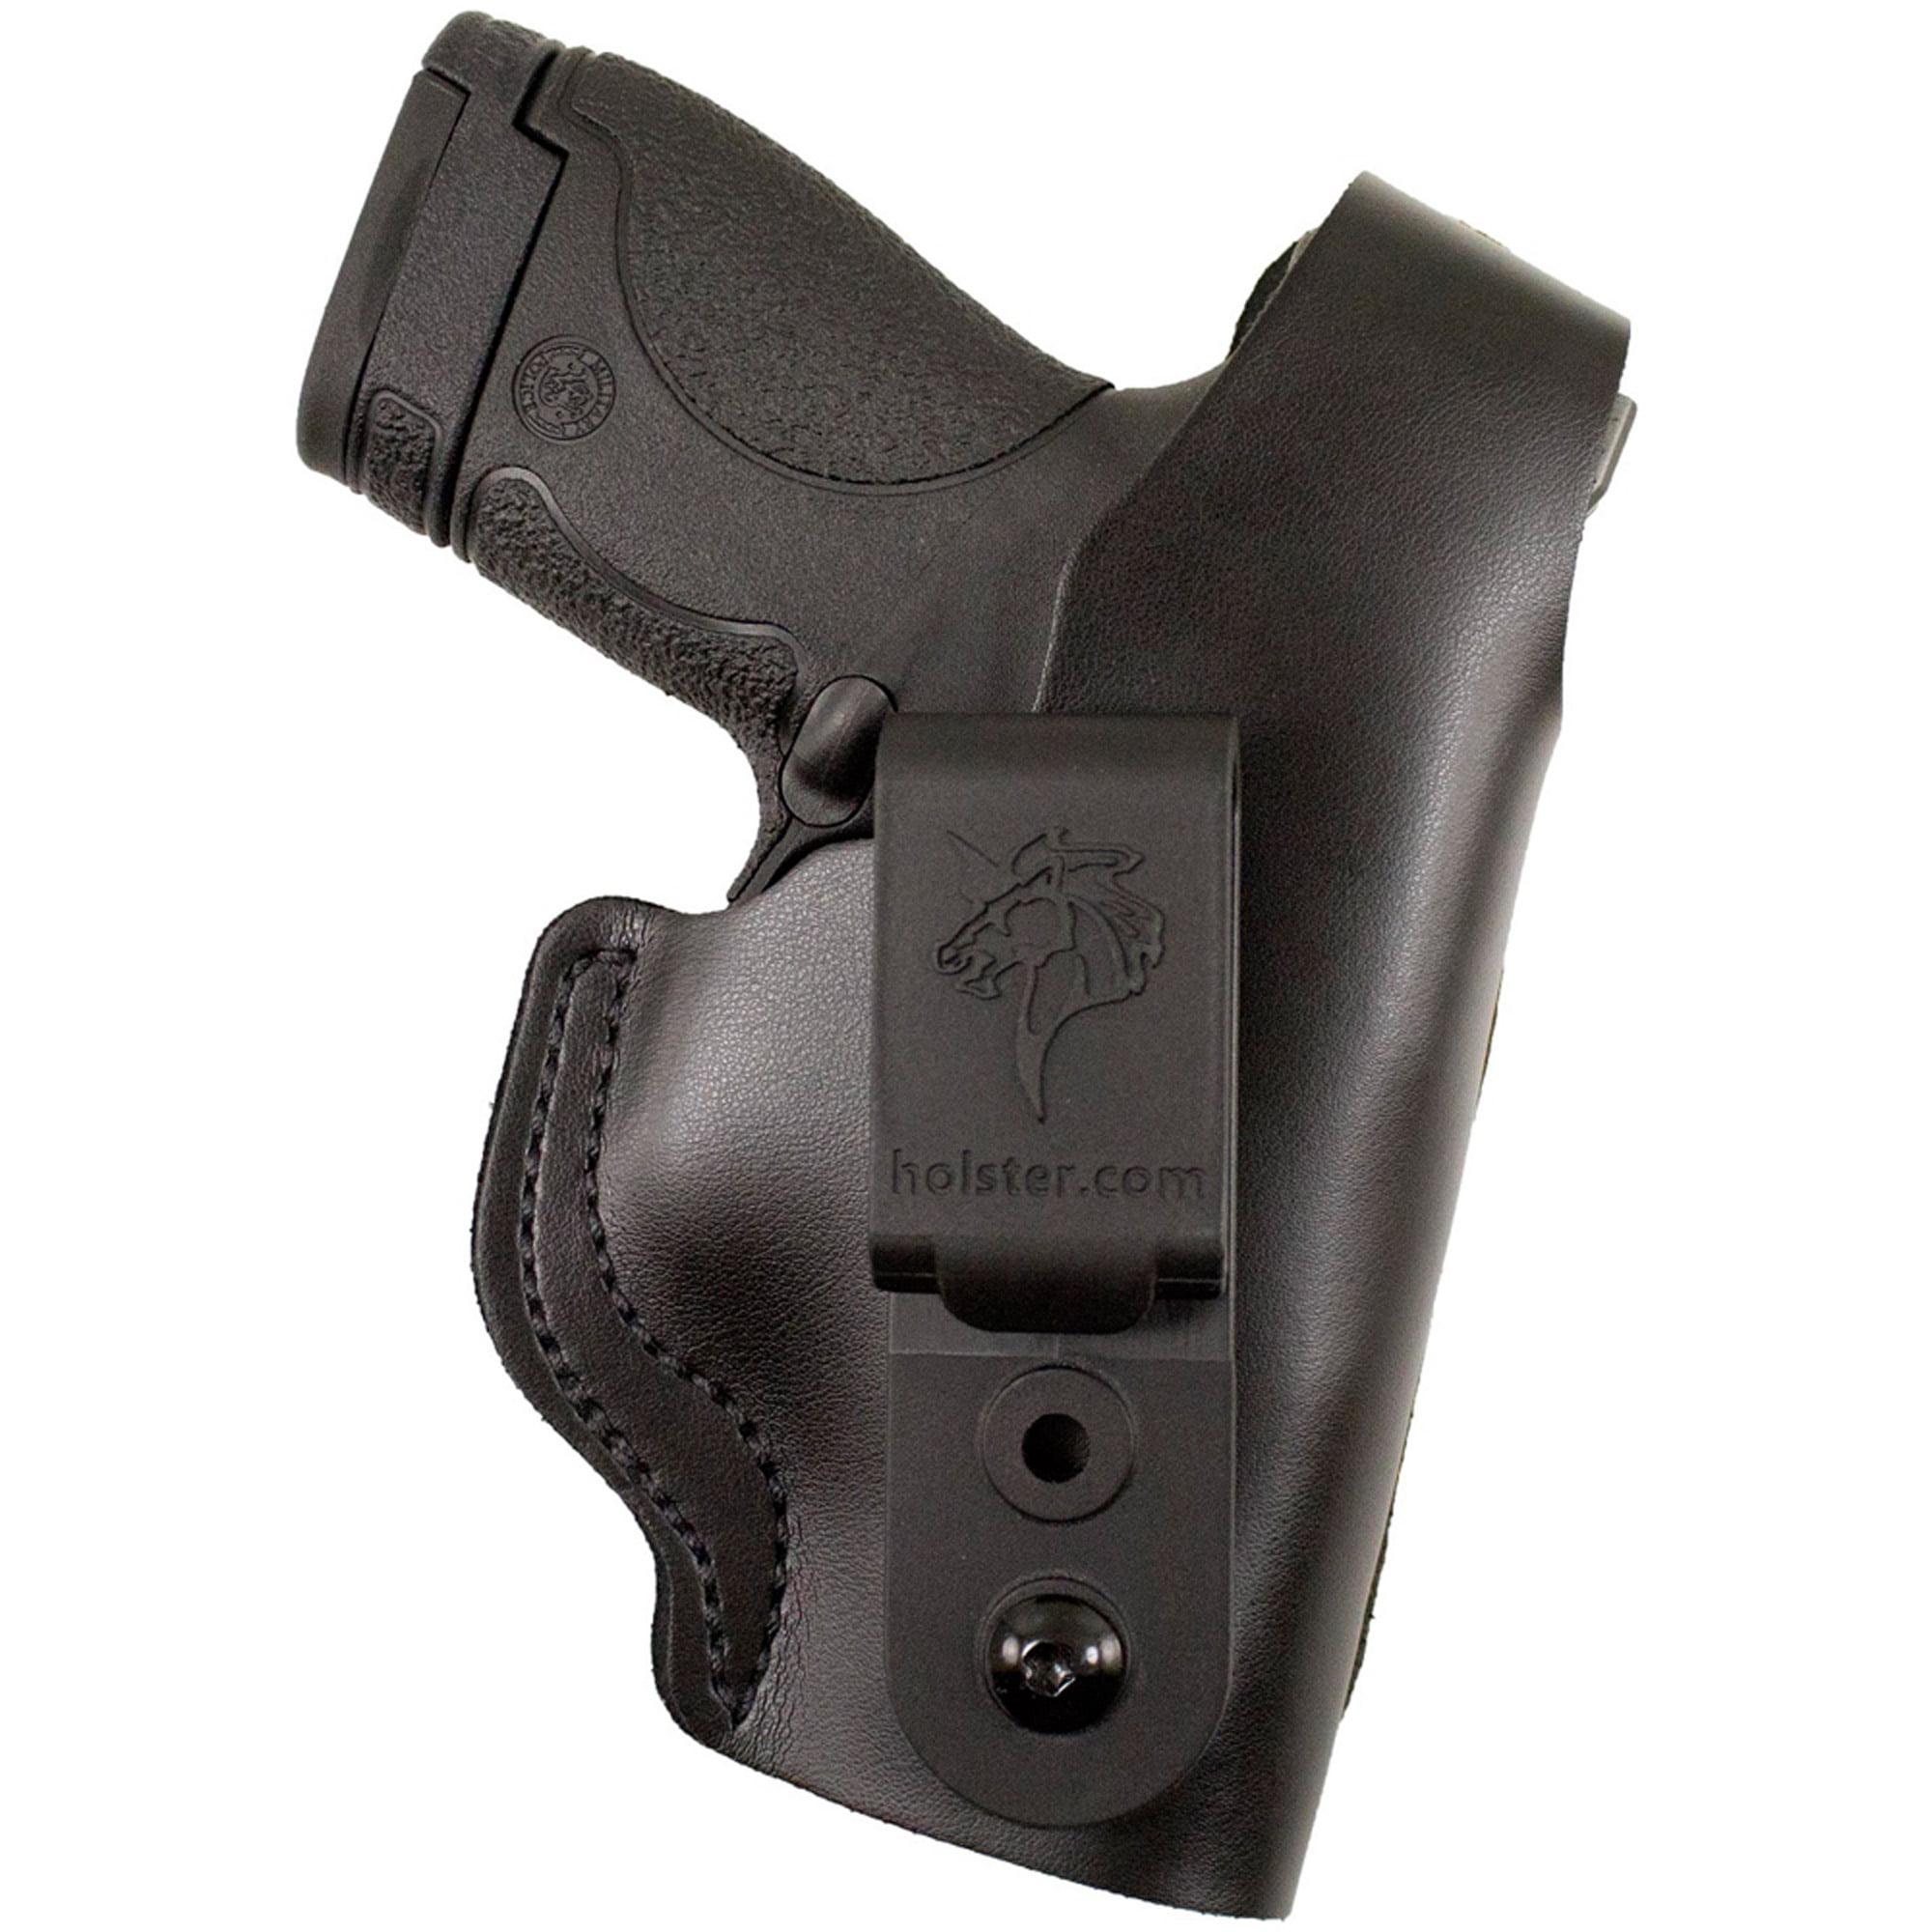 DeSantis Dual Carry II Holster, Fits Glock 19-23-32-36 by Desantis